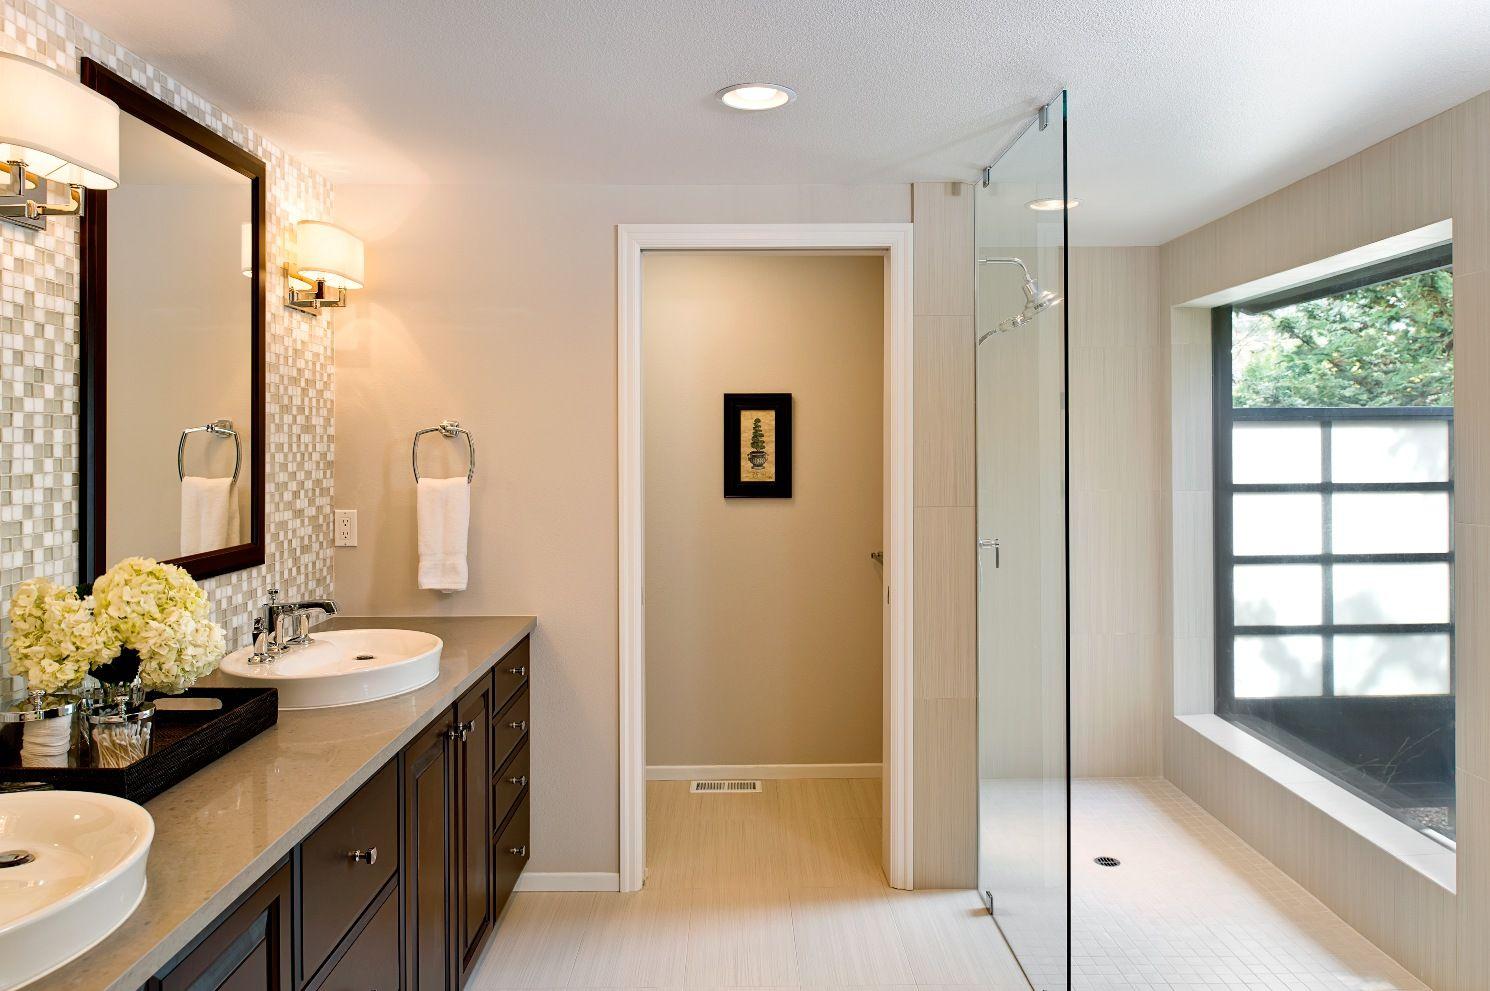 Bathroom Remodel With Mosaic Tile Back Splash By